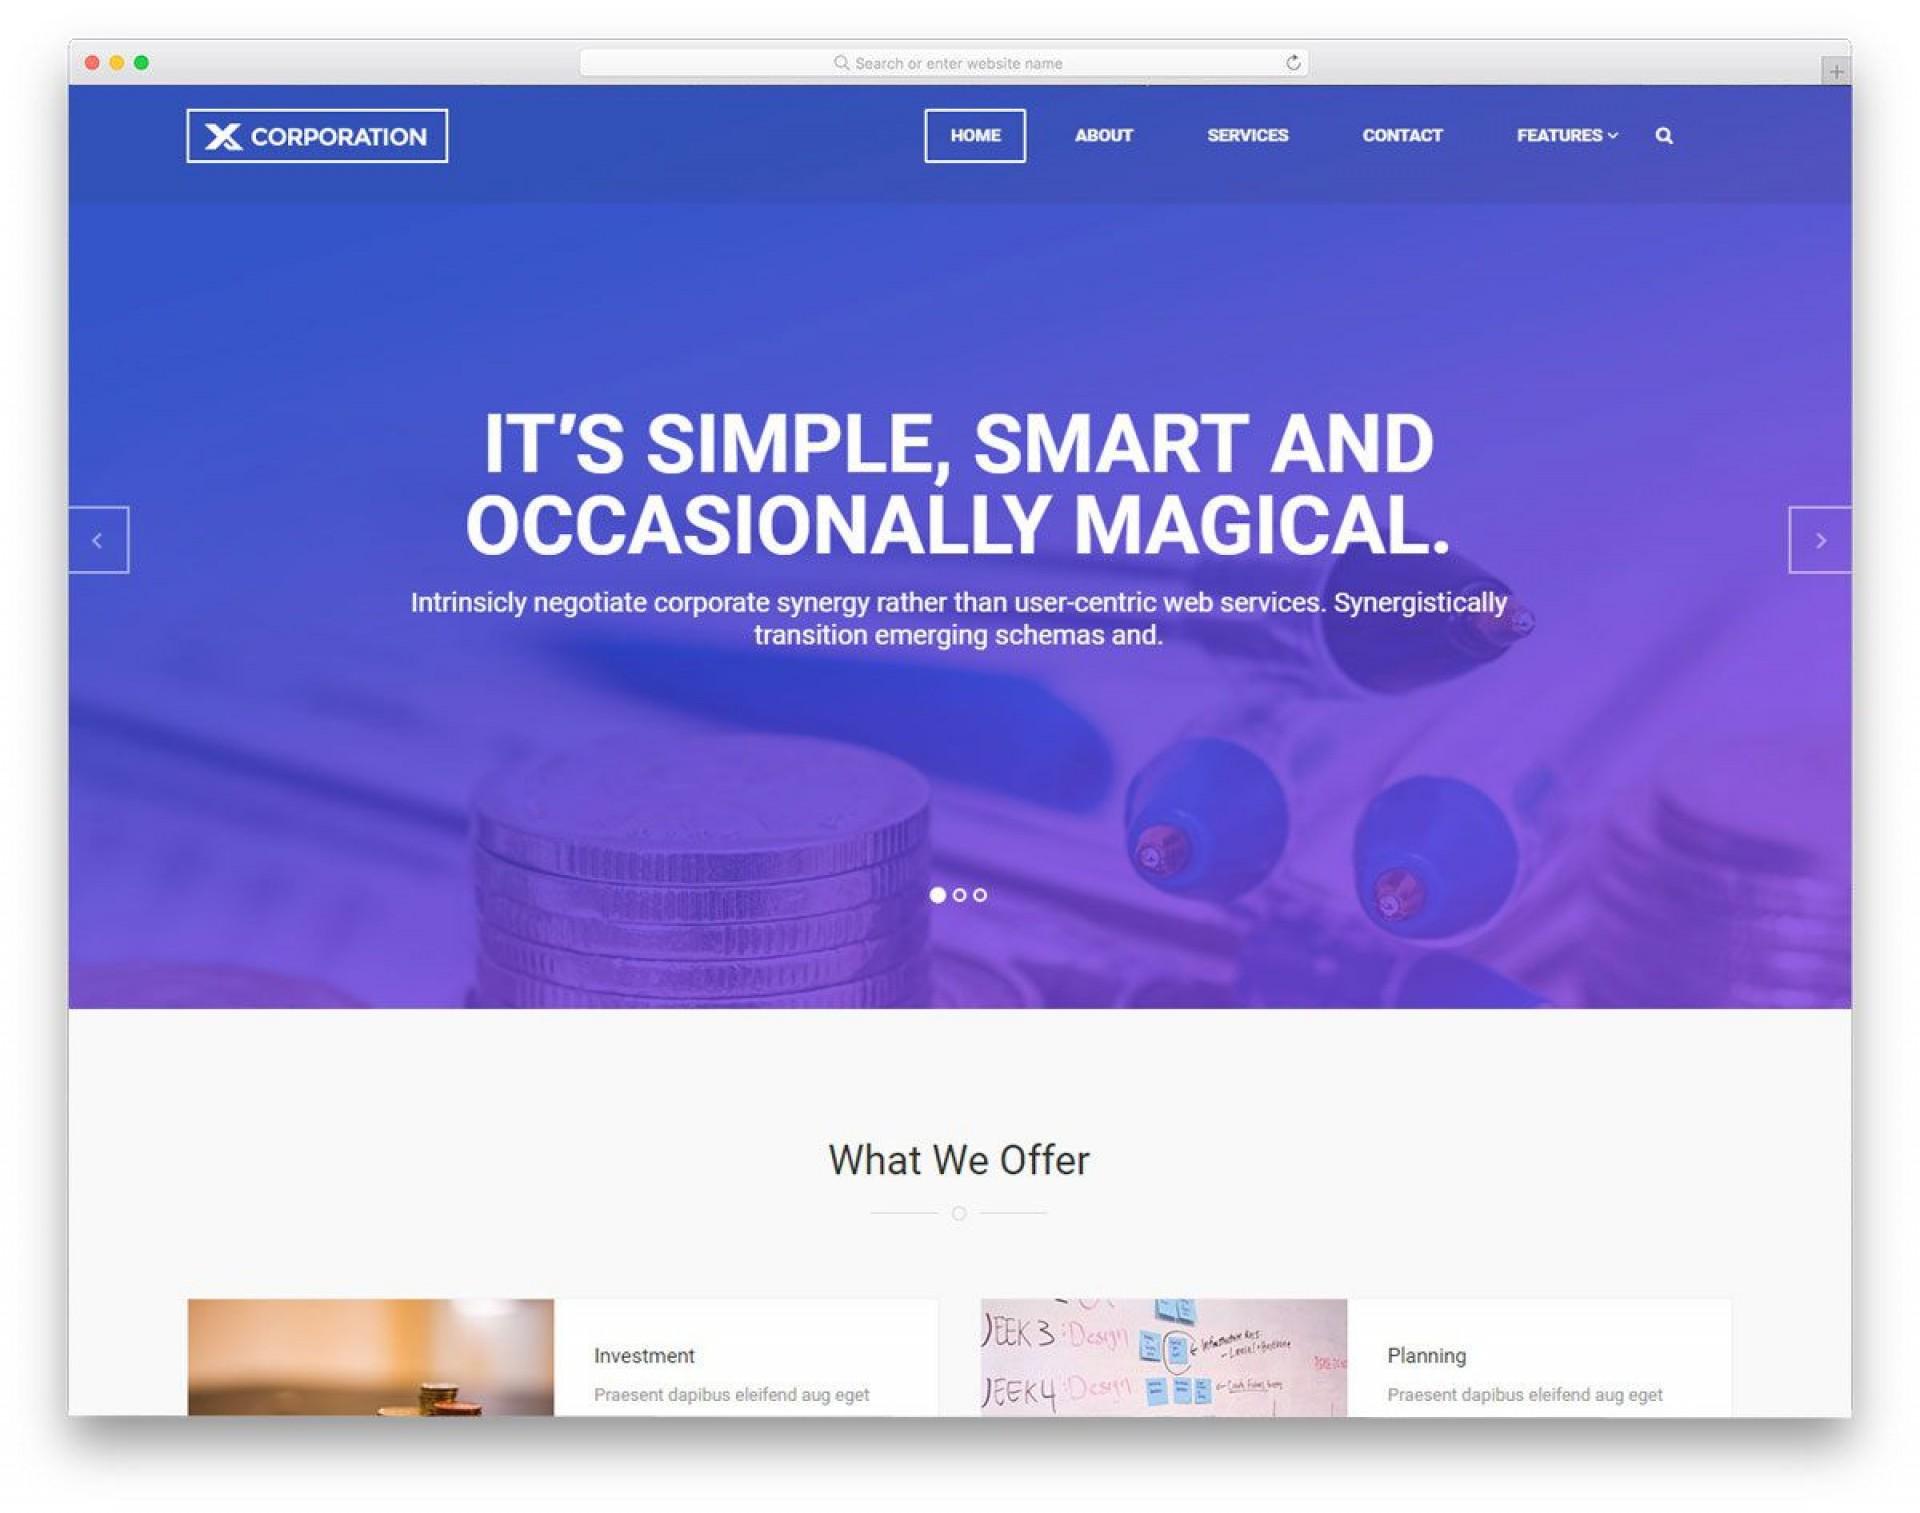 009 Wonderful Web Page Design Template Cs High Def  Css1920